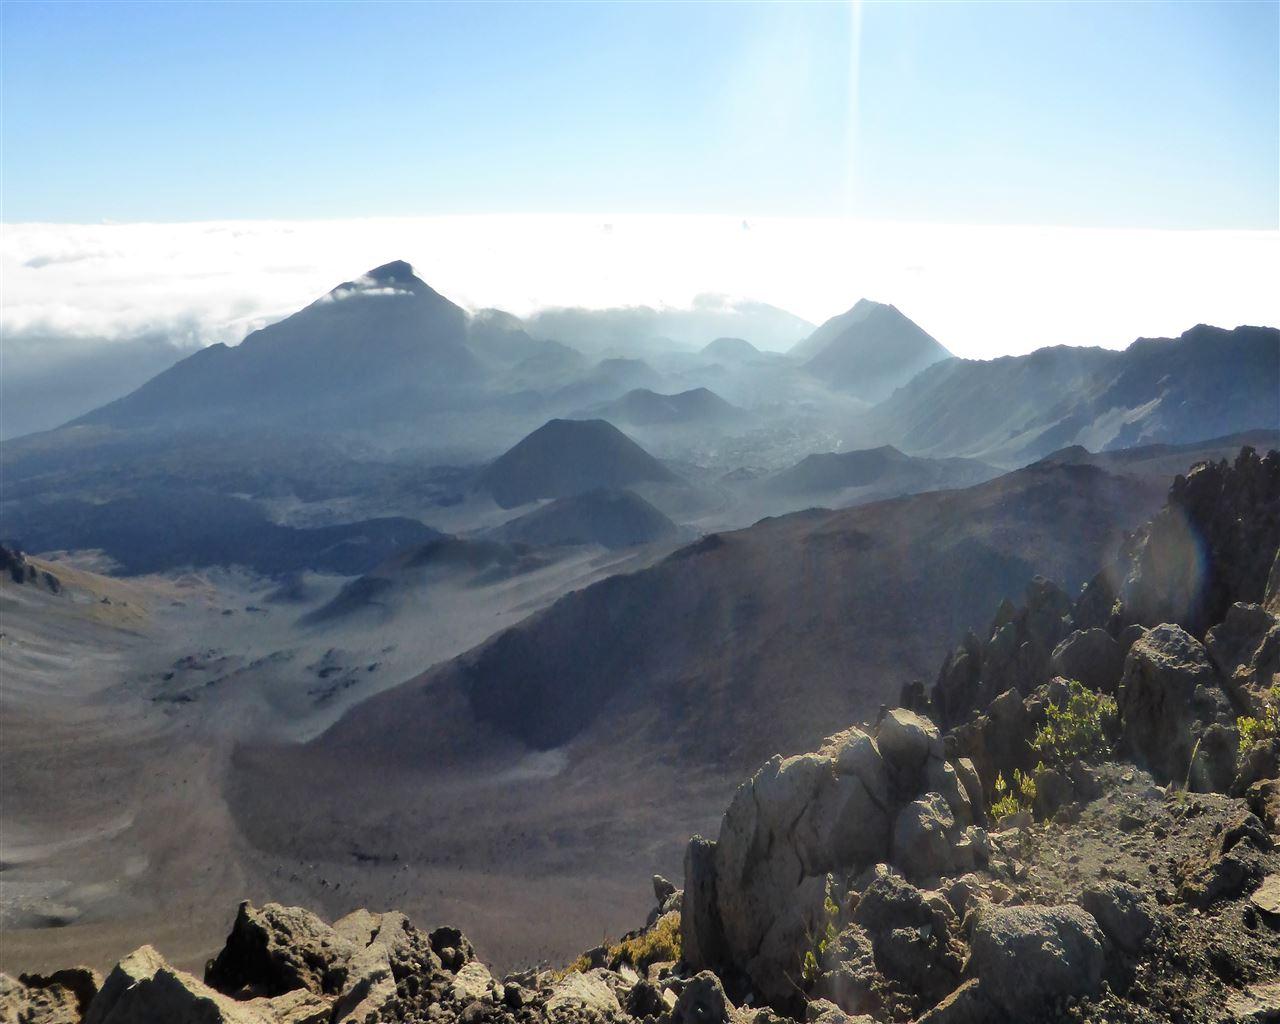 Vulkankrater auf Maui